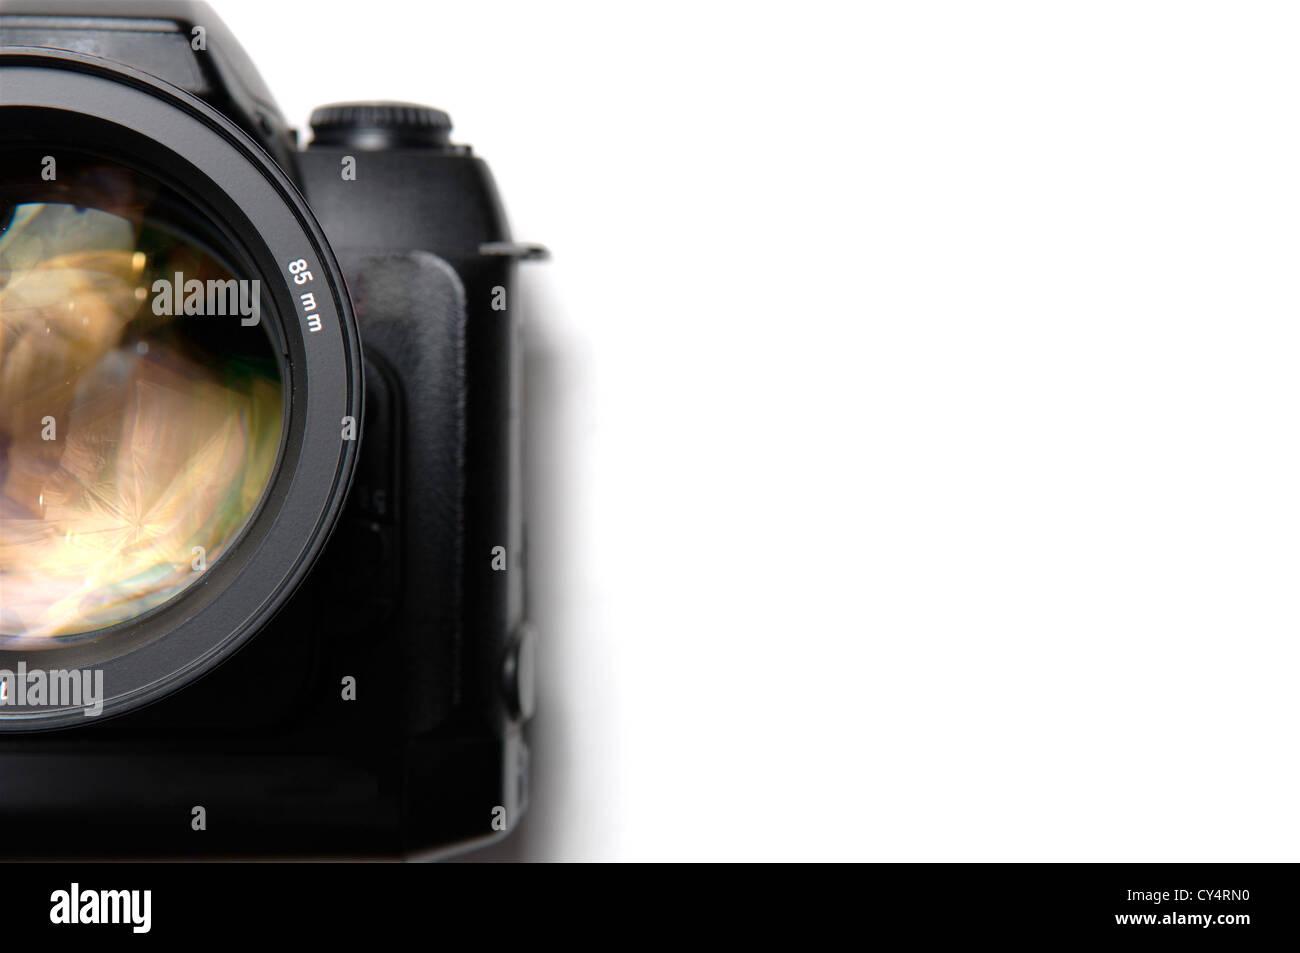 Professional digital camera closeup - Stock Image